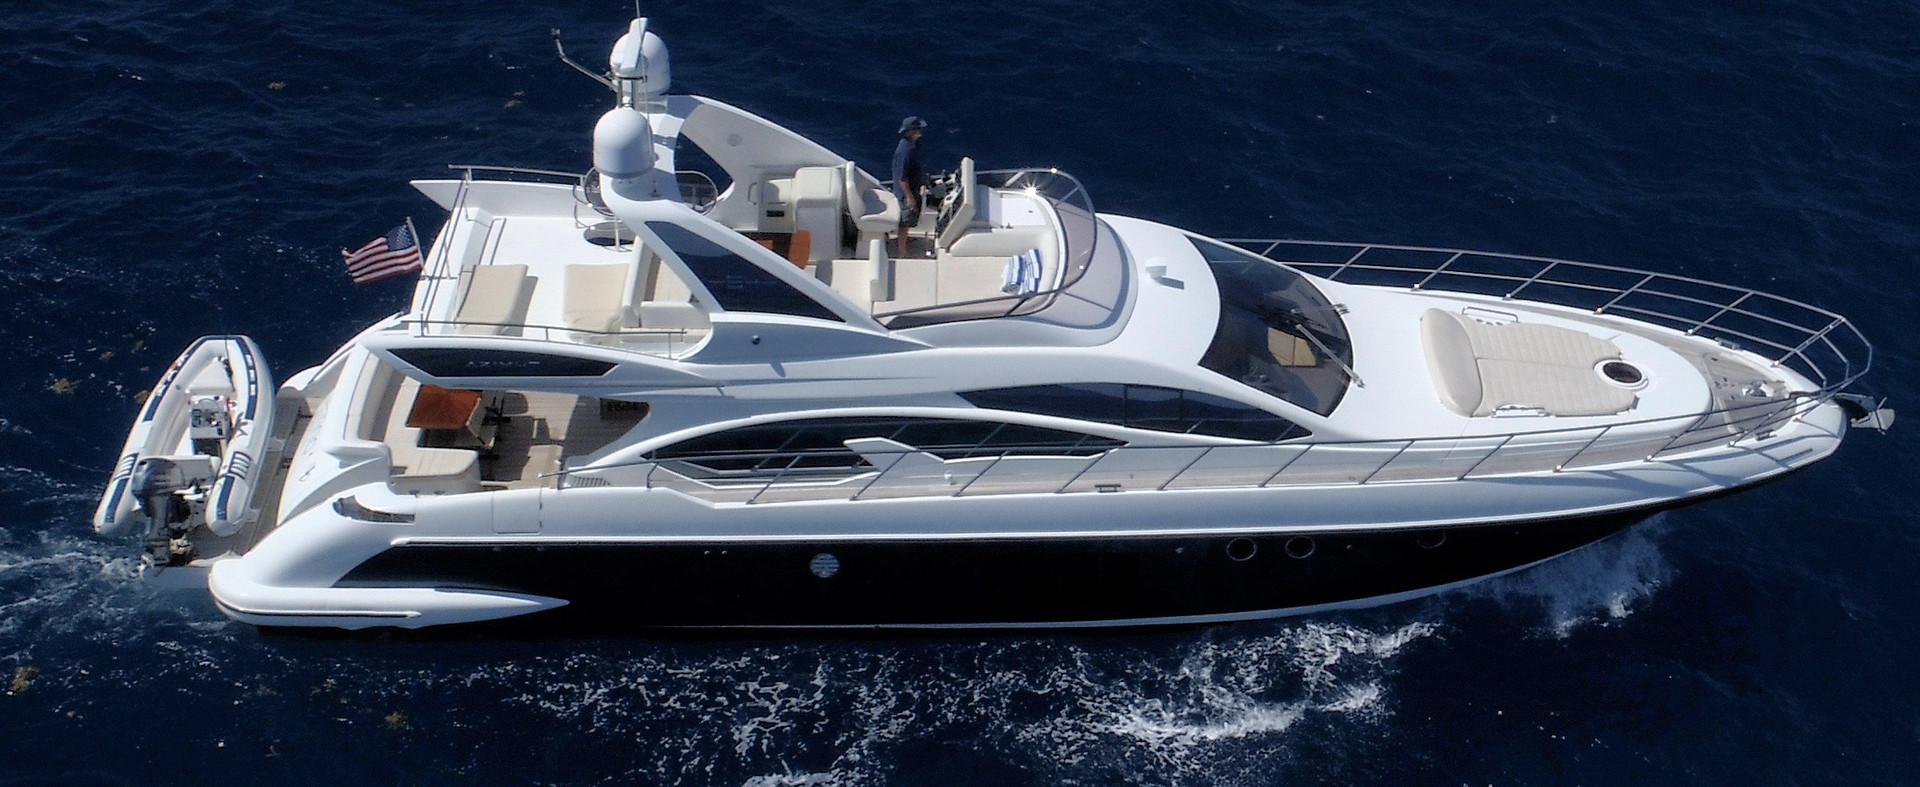 Yacht - Ryan Craft - 5-3-2017 (5 of 50)E